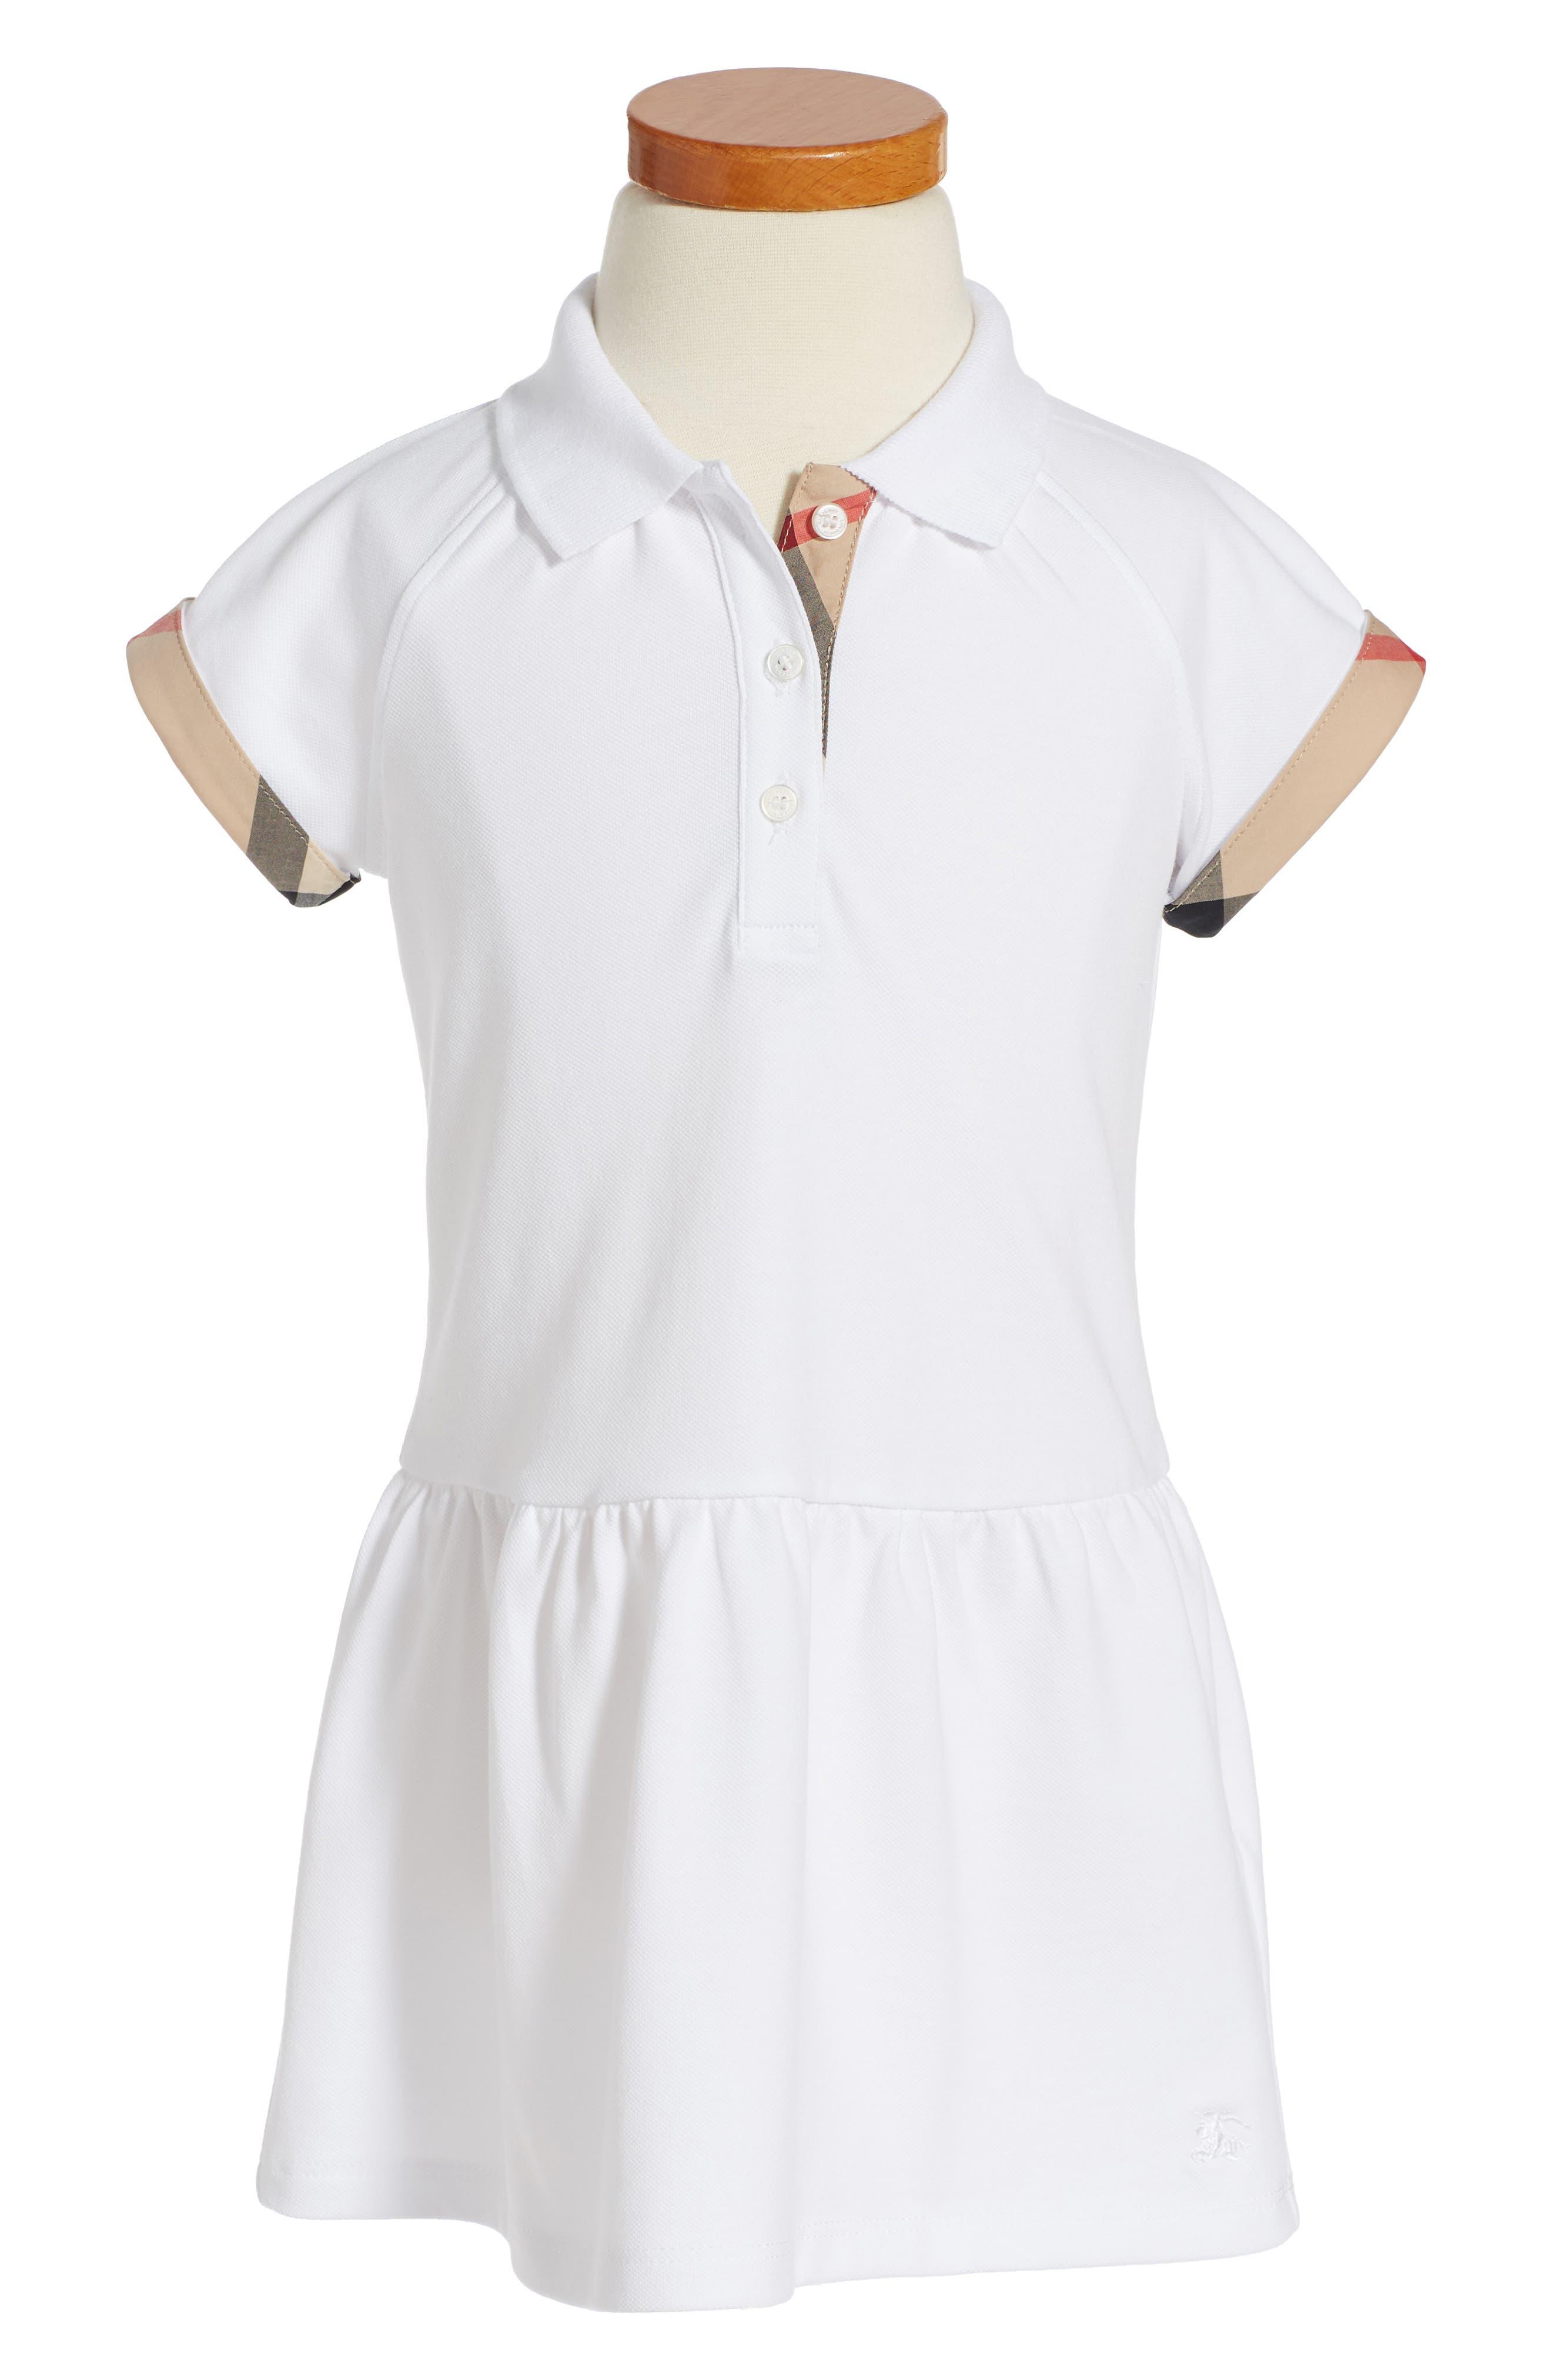 Alternate Image 1 Selected - Burberry Mini Cali Polo Dress (Toddler Girls)